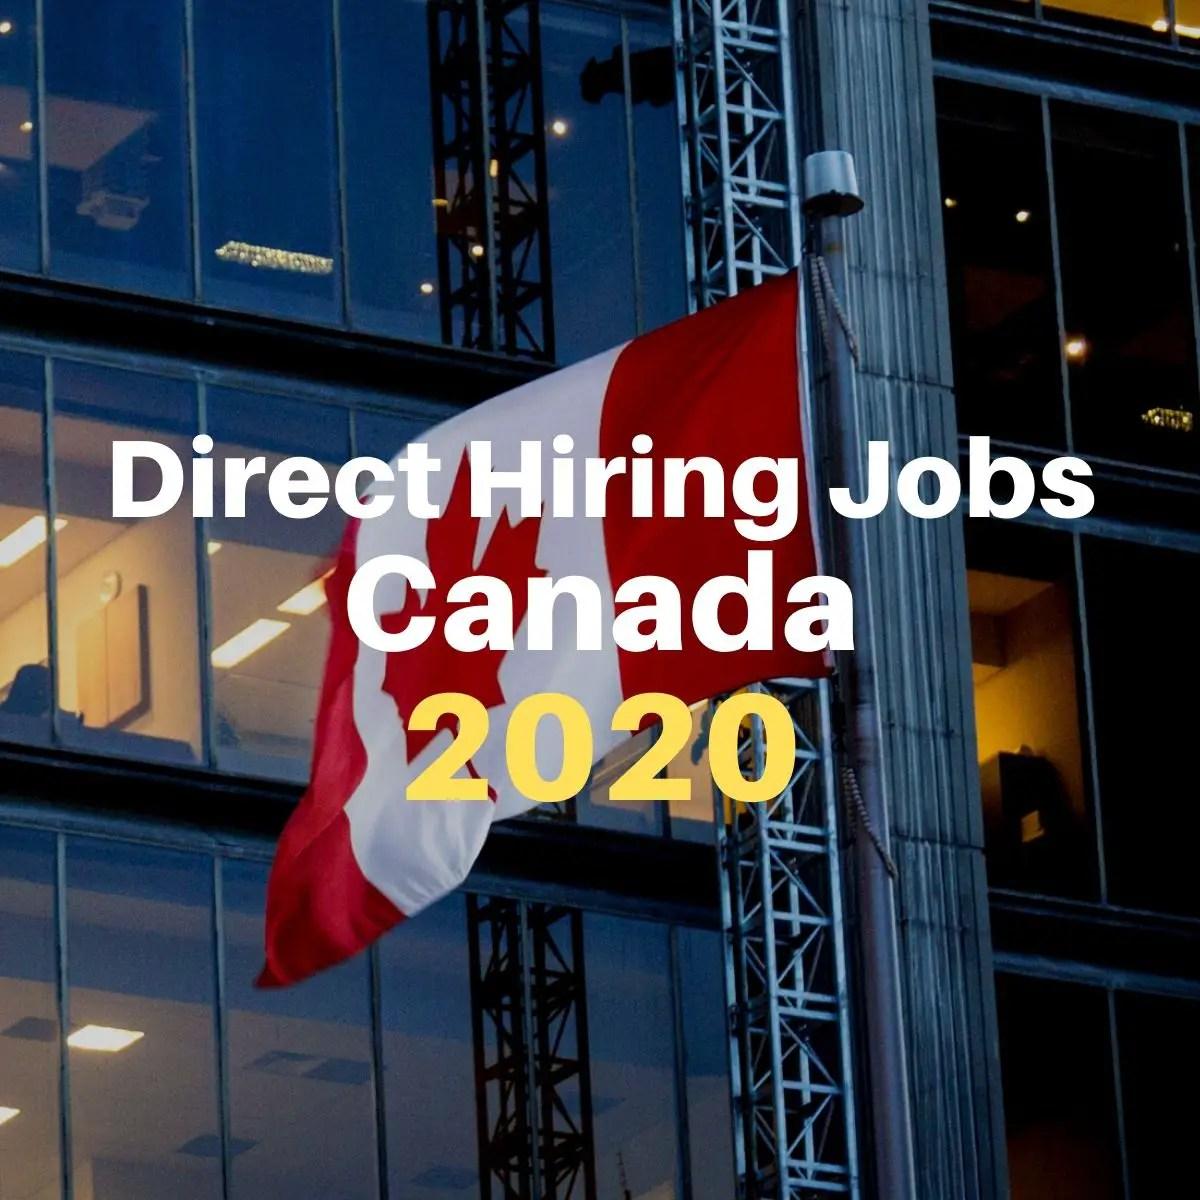 direct hiring jobs canada 2020